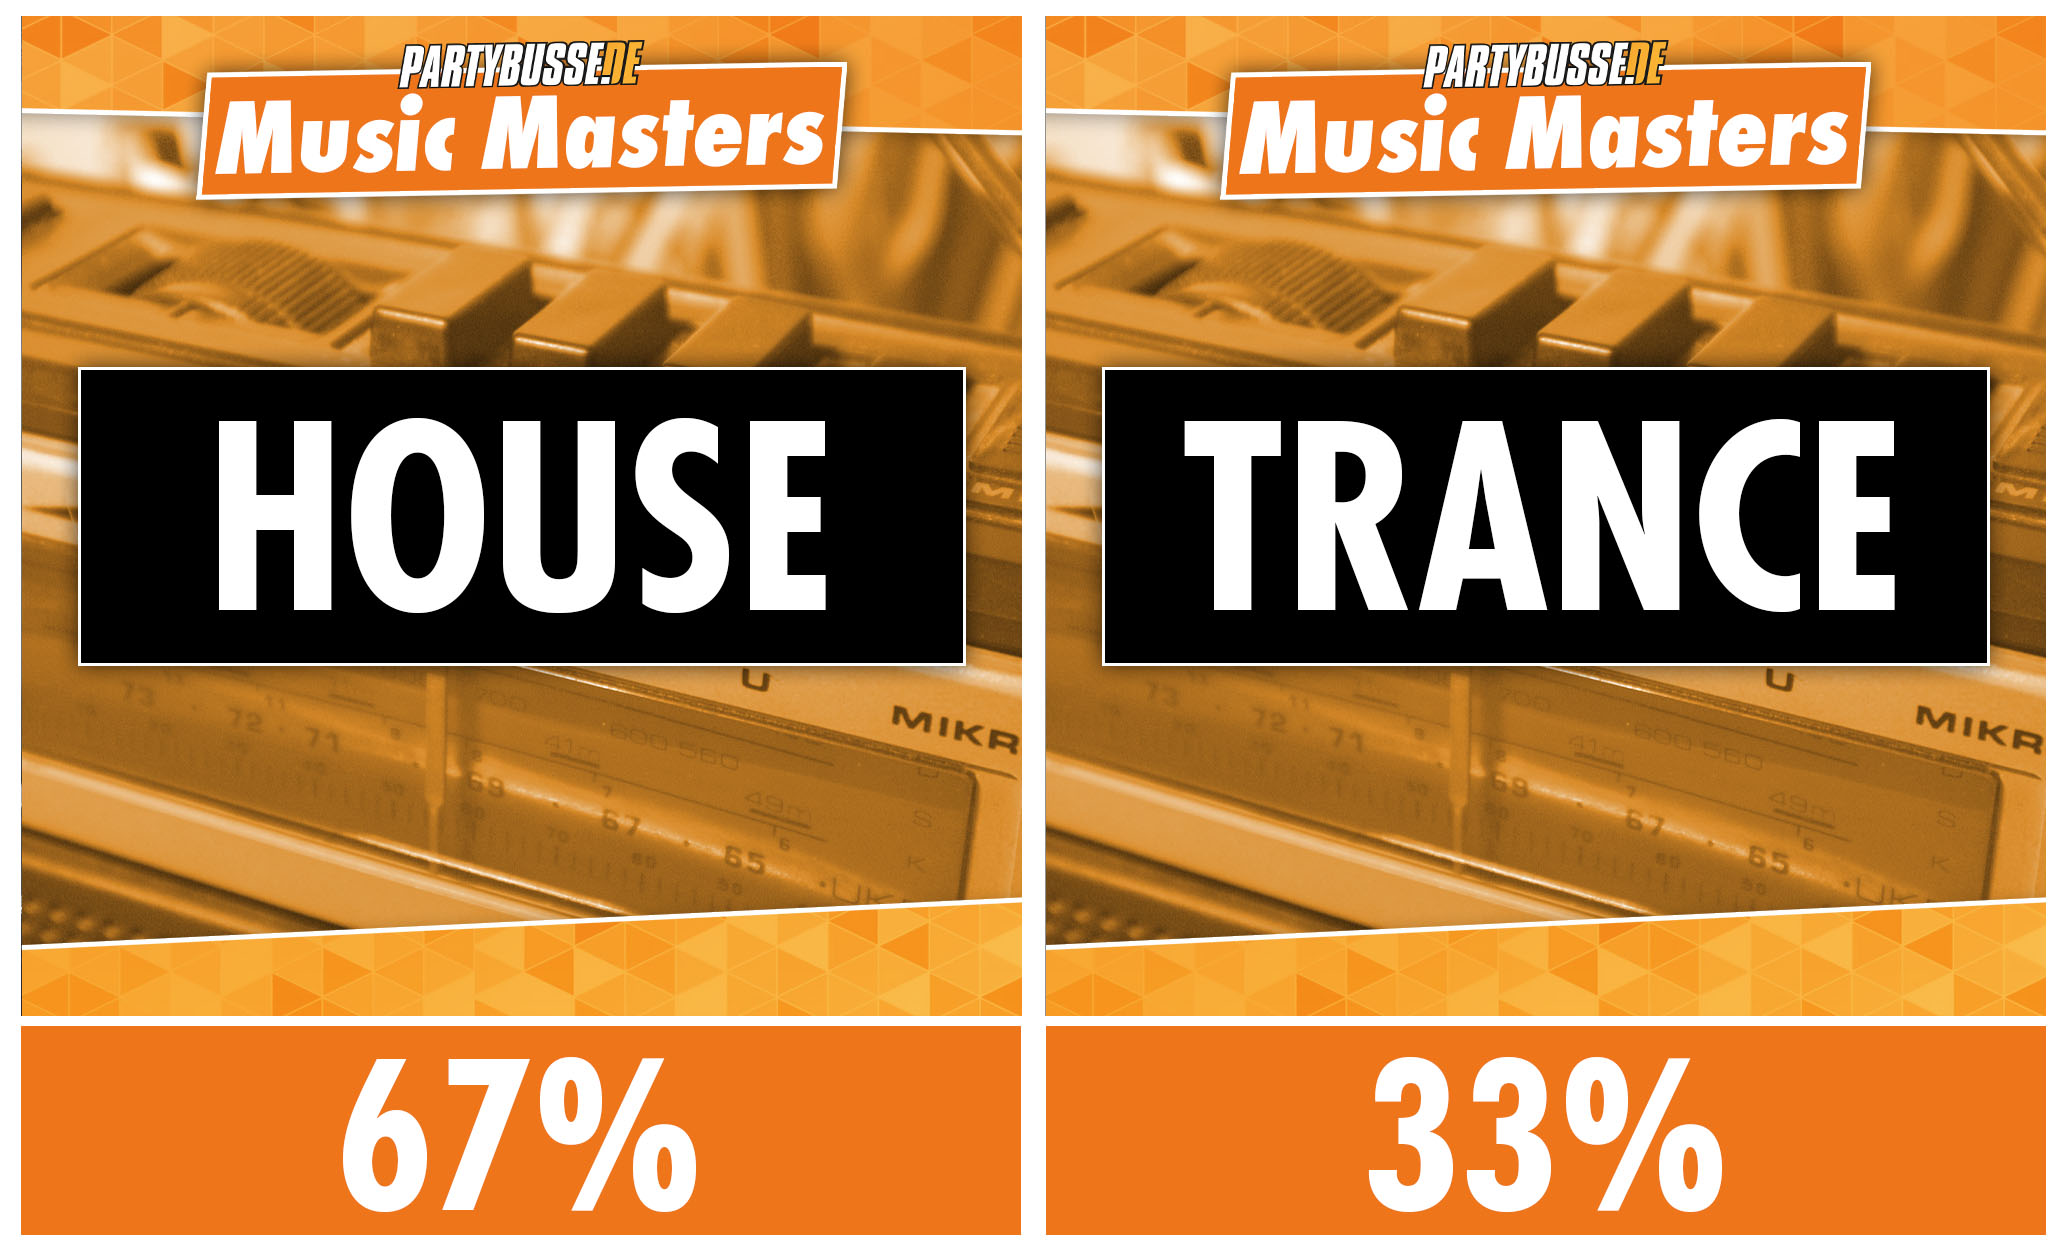 Music Masters - Halbfinale 2